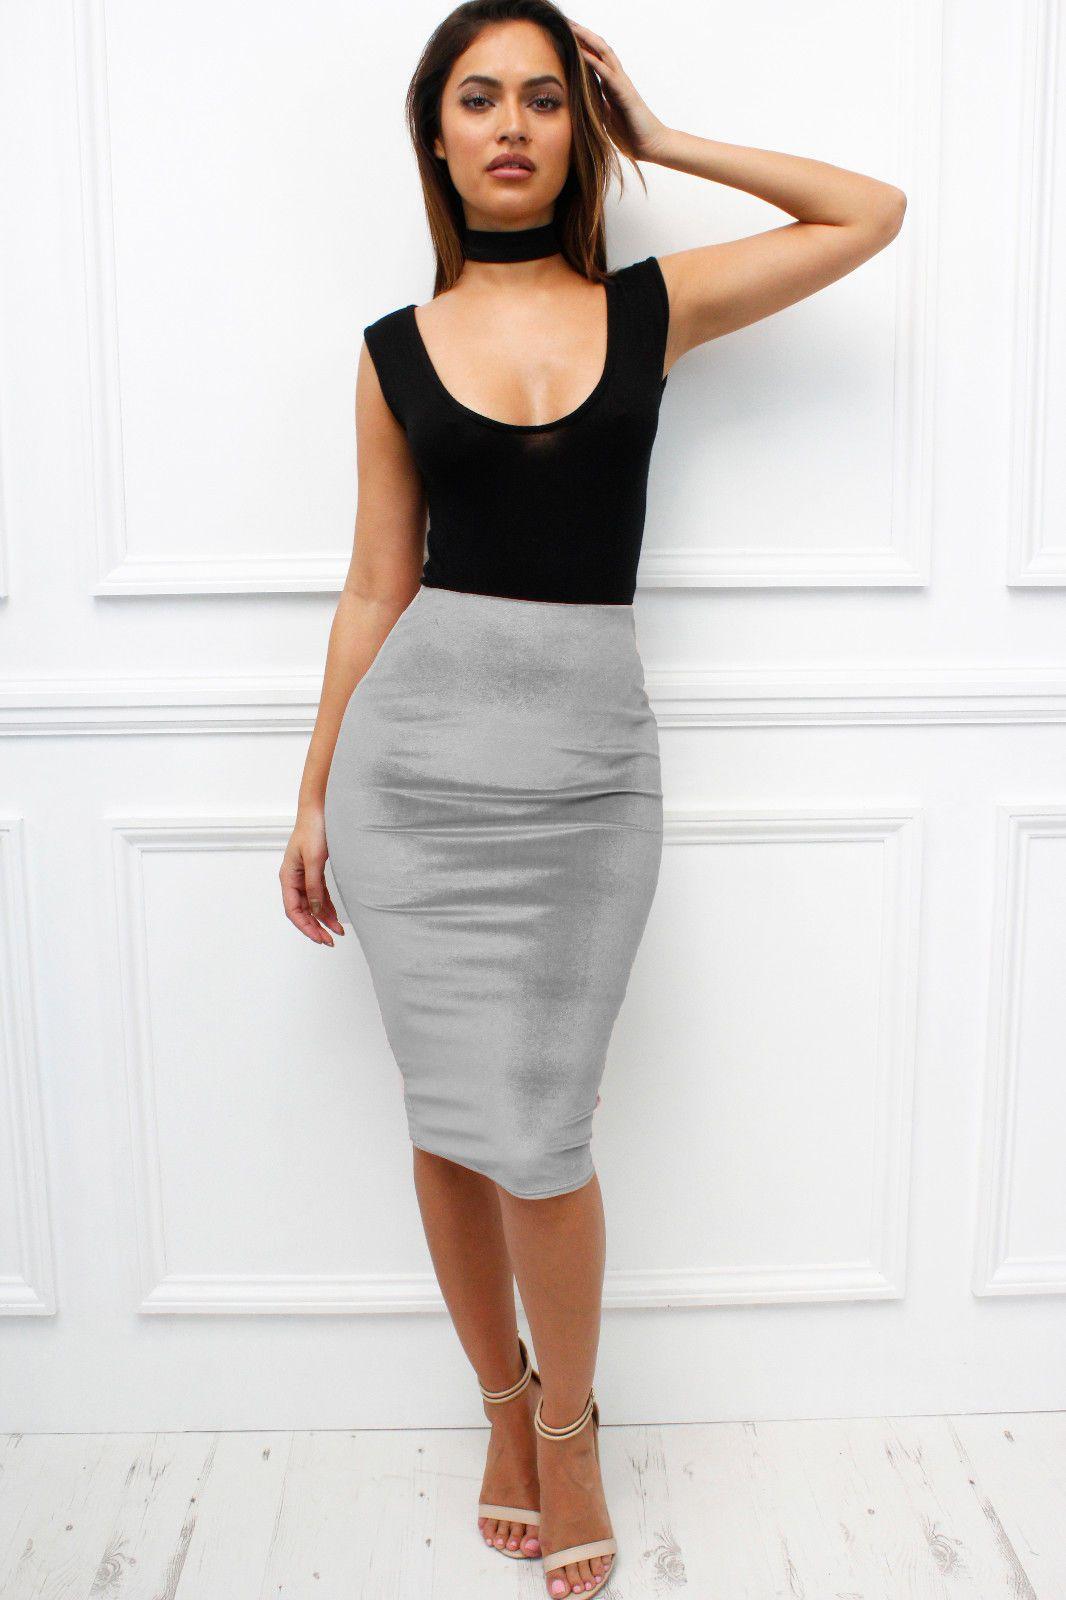 926af193f2 Uk Velvet Velour Silver High Waisted Grey Stretch Midi Bodycon Pencil Skirt